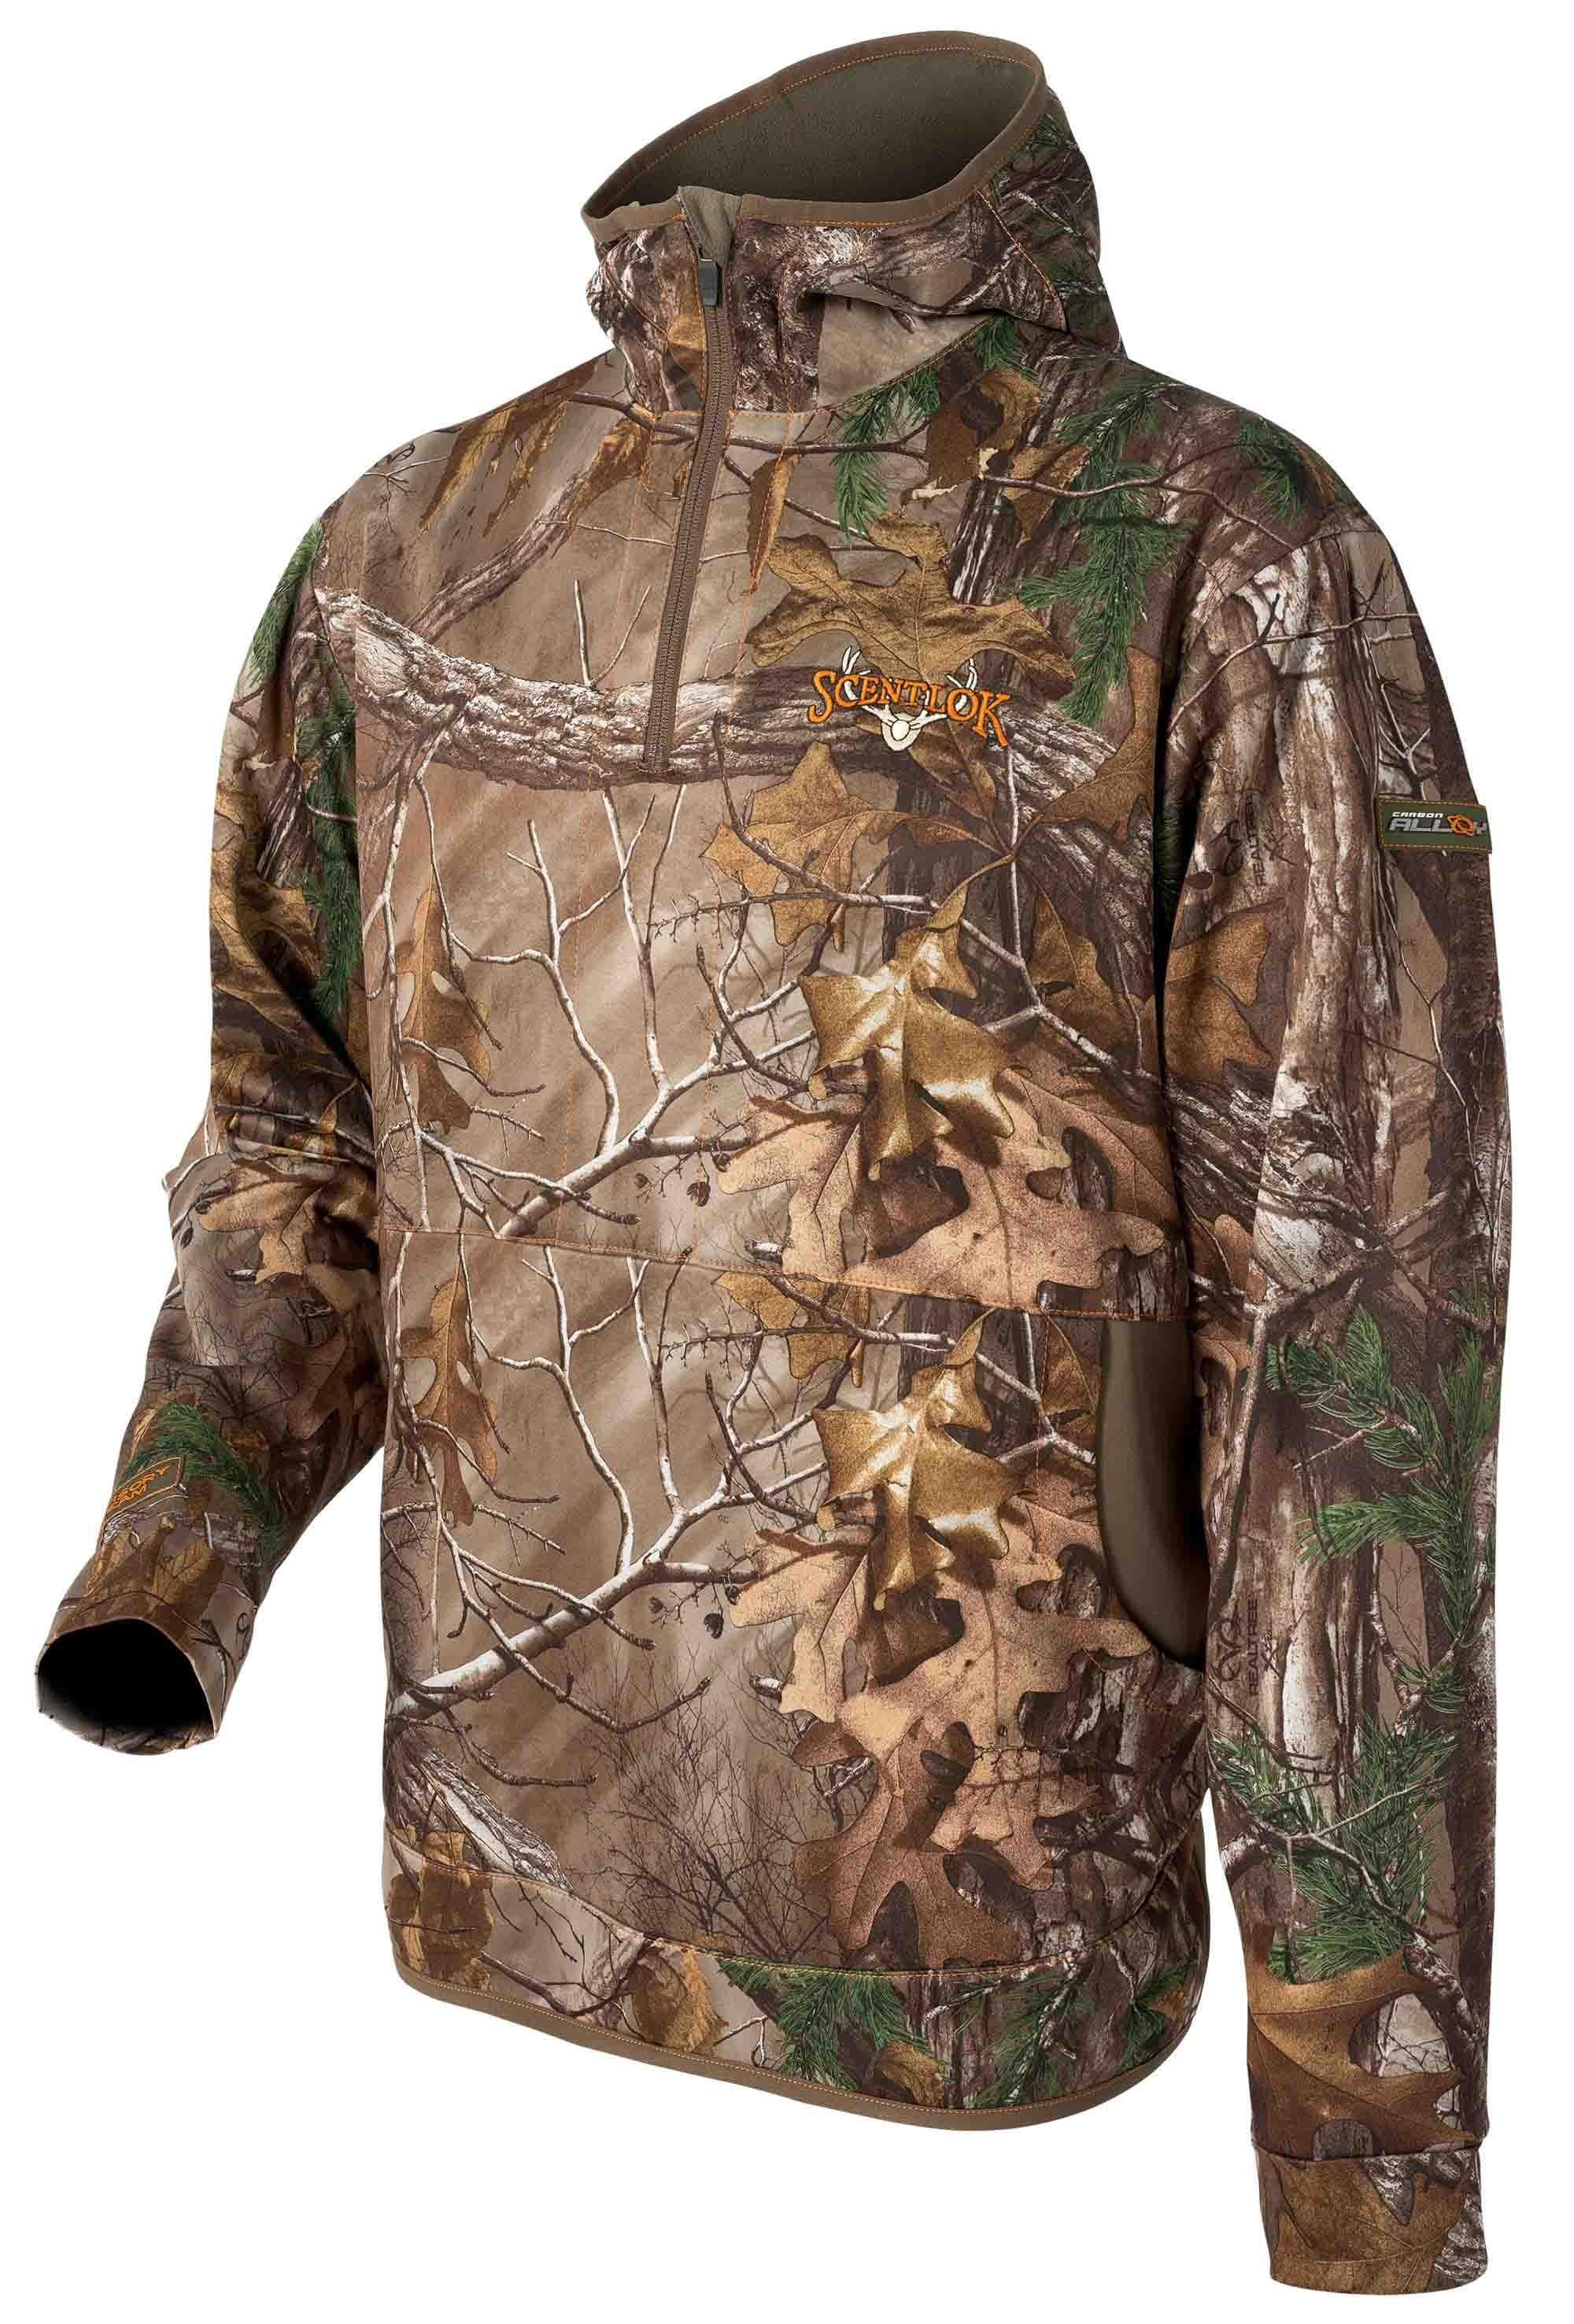 slok-hi-tech-hoodie-angled